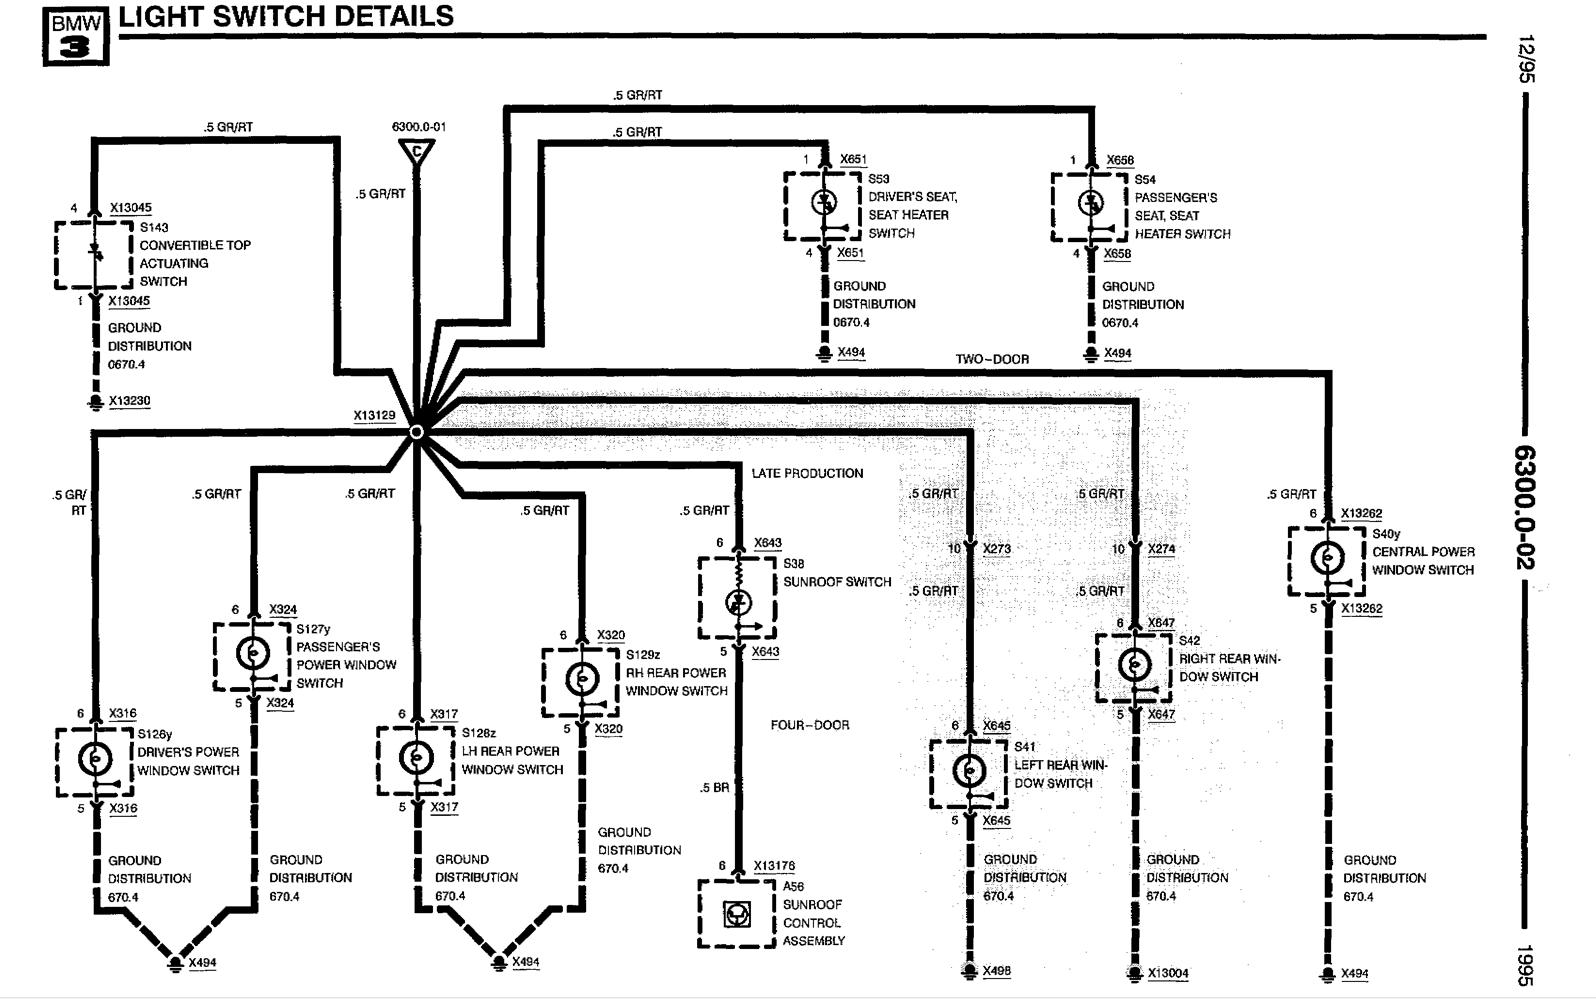 hight resolution of bmw wiring diagram e36 wiring diagram third level bmw e38 radio wiring diagram 98 e36 wiring